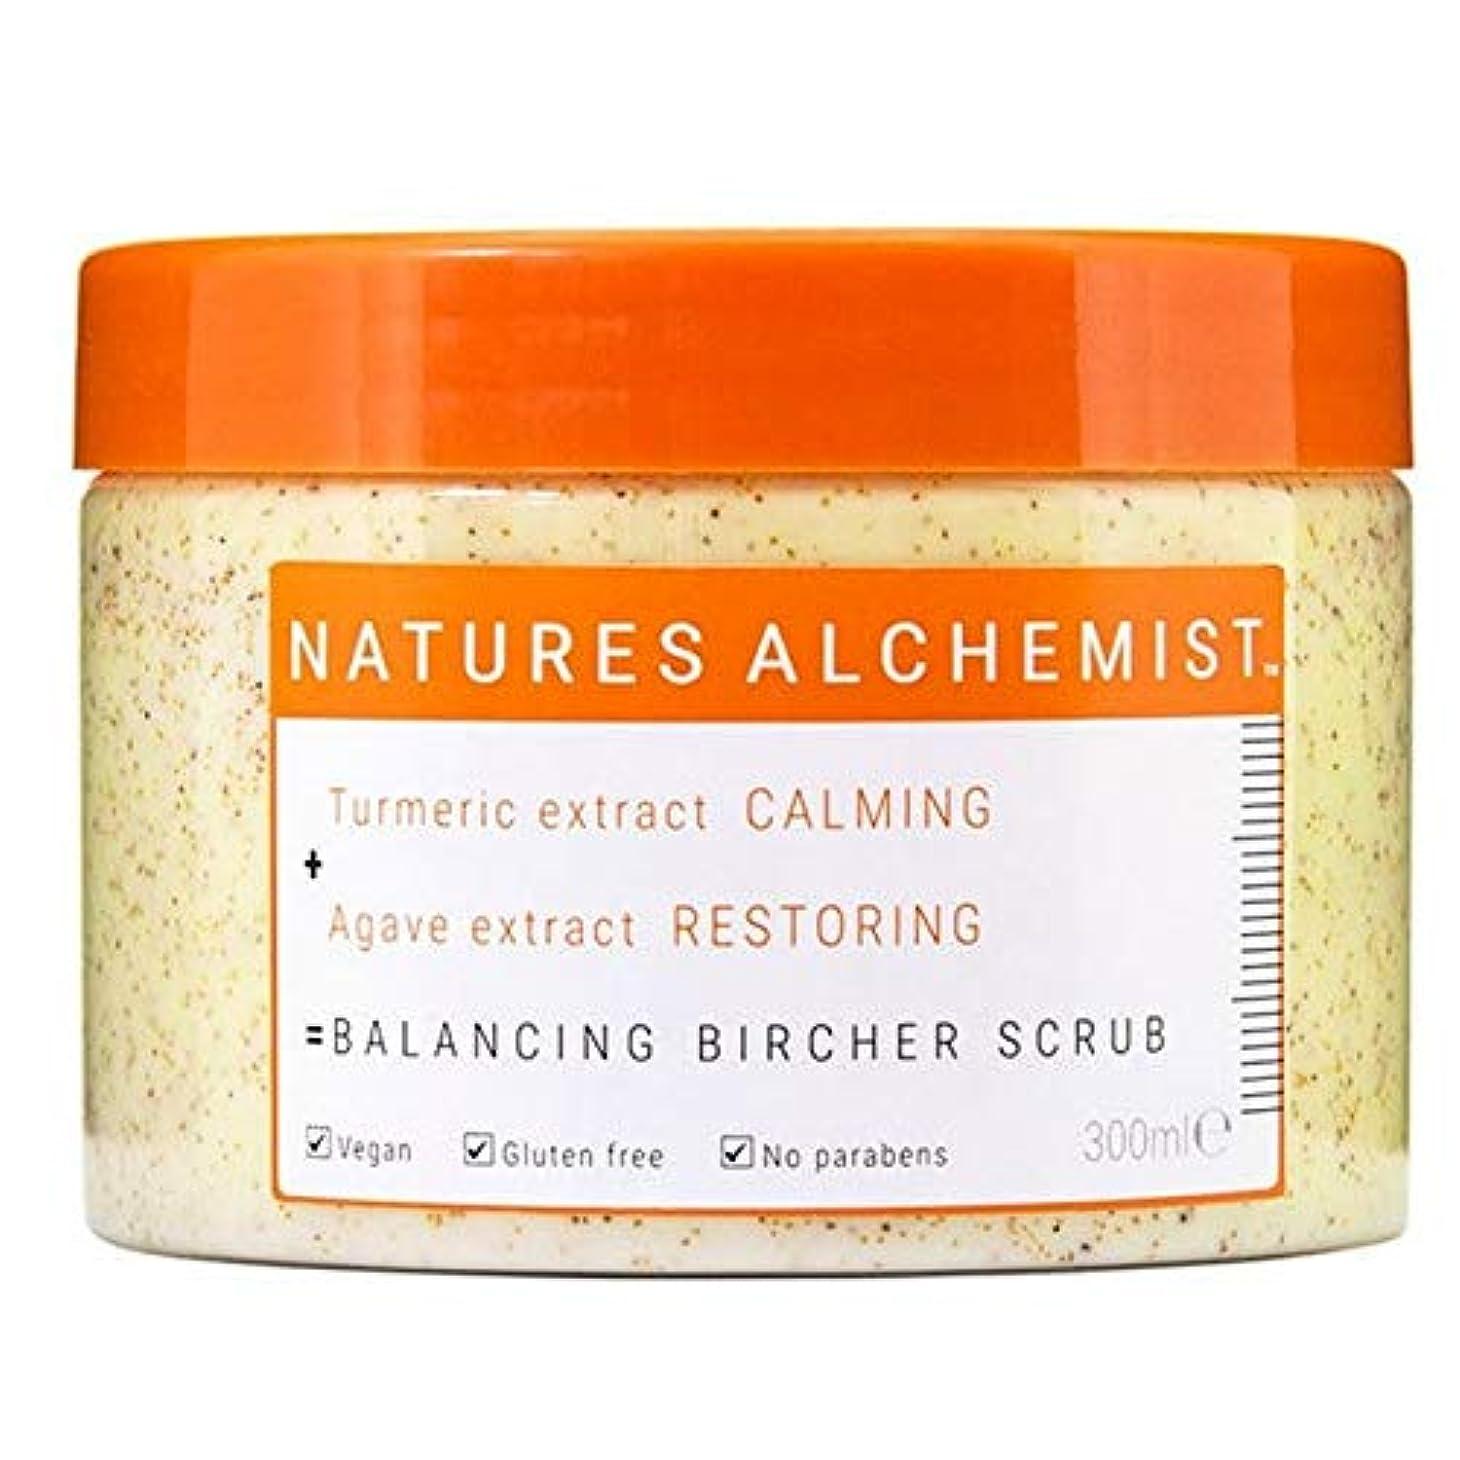 [Natures Alchemist ] 性質はBircherスクラブのバランスをとる錬金術師 - Natures Alchemist Balancing Bircher Scrub [並行輸入品]